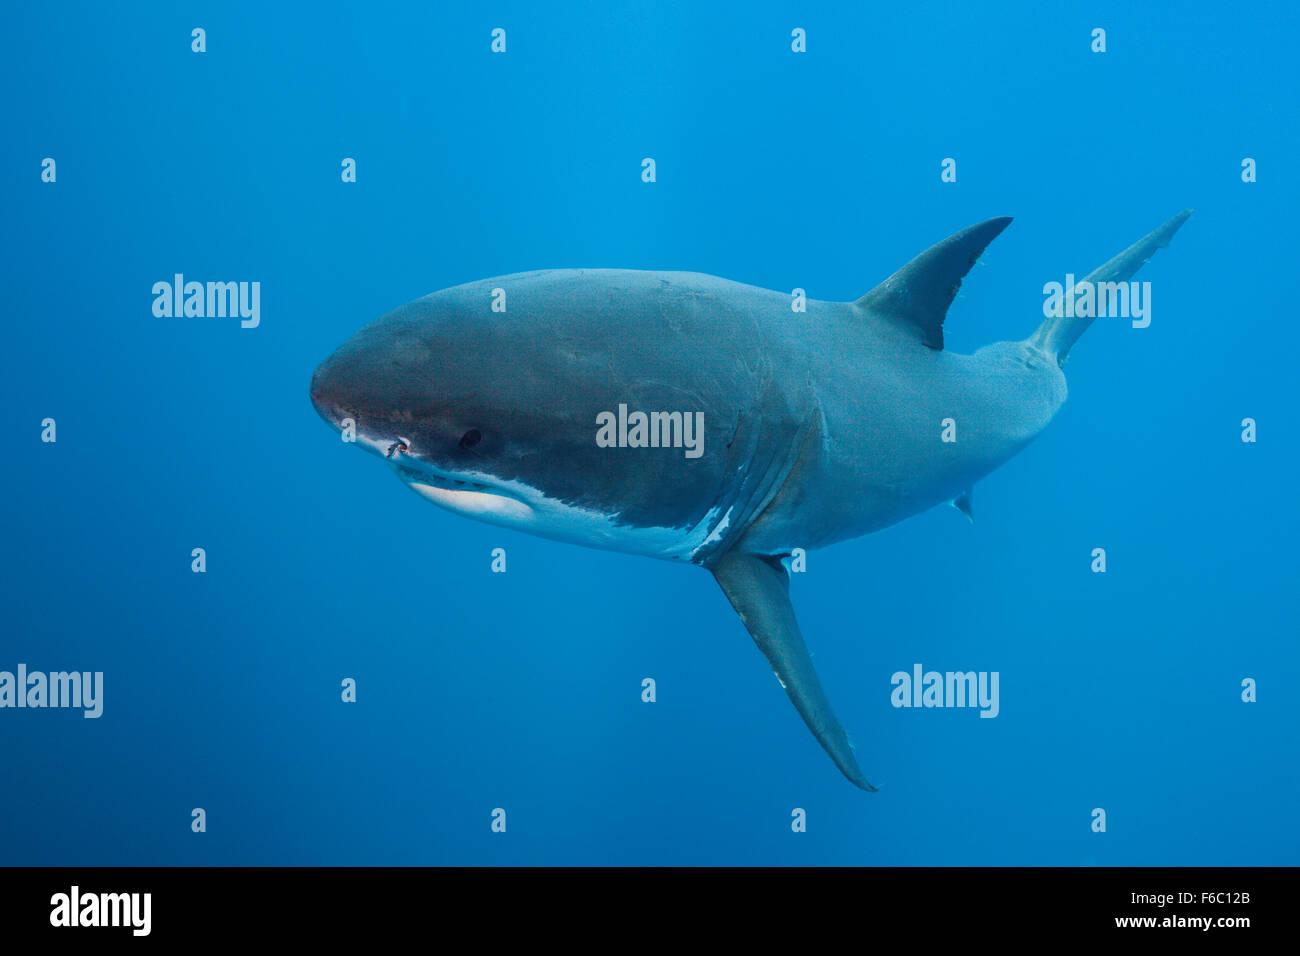 Great White Shark, Carcharodon carcharias, Neptune Islands, Australia - Stock Image